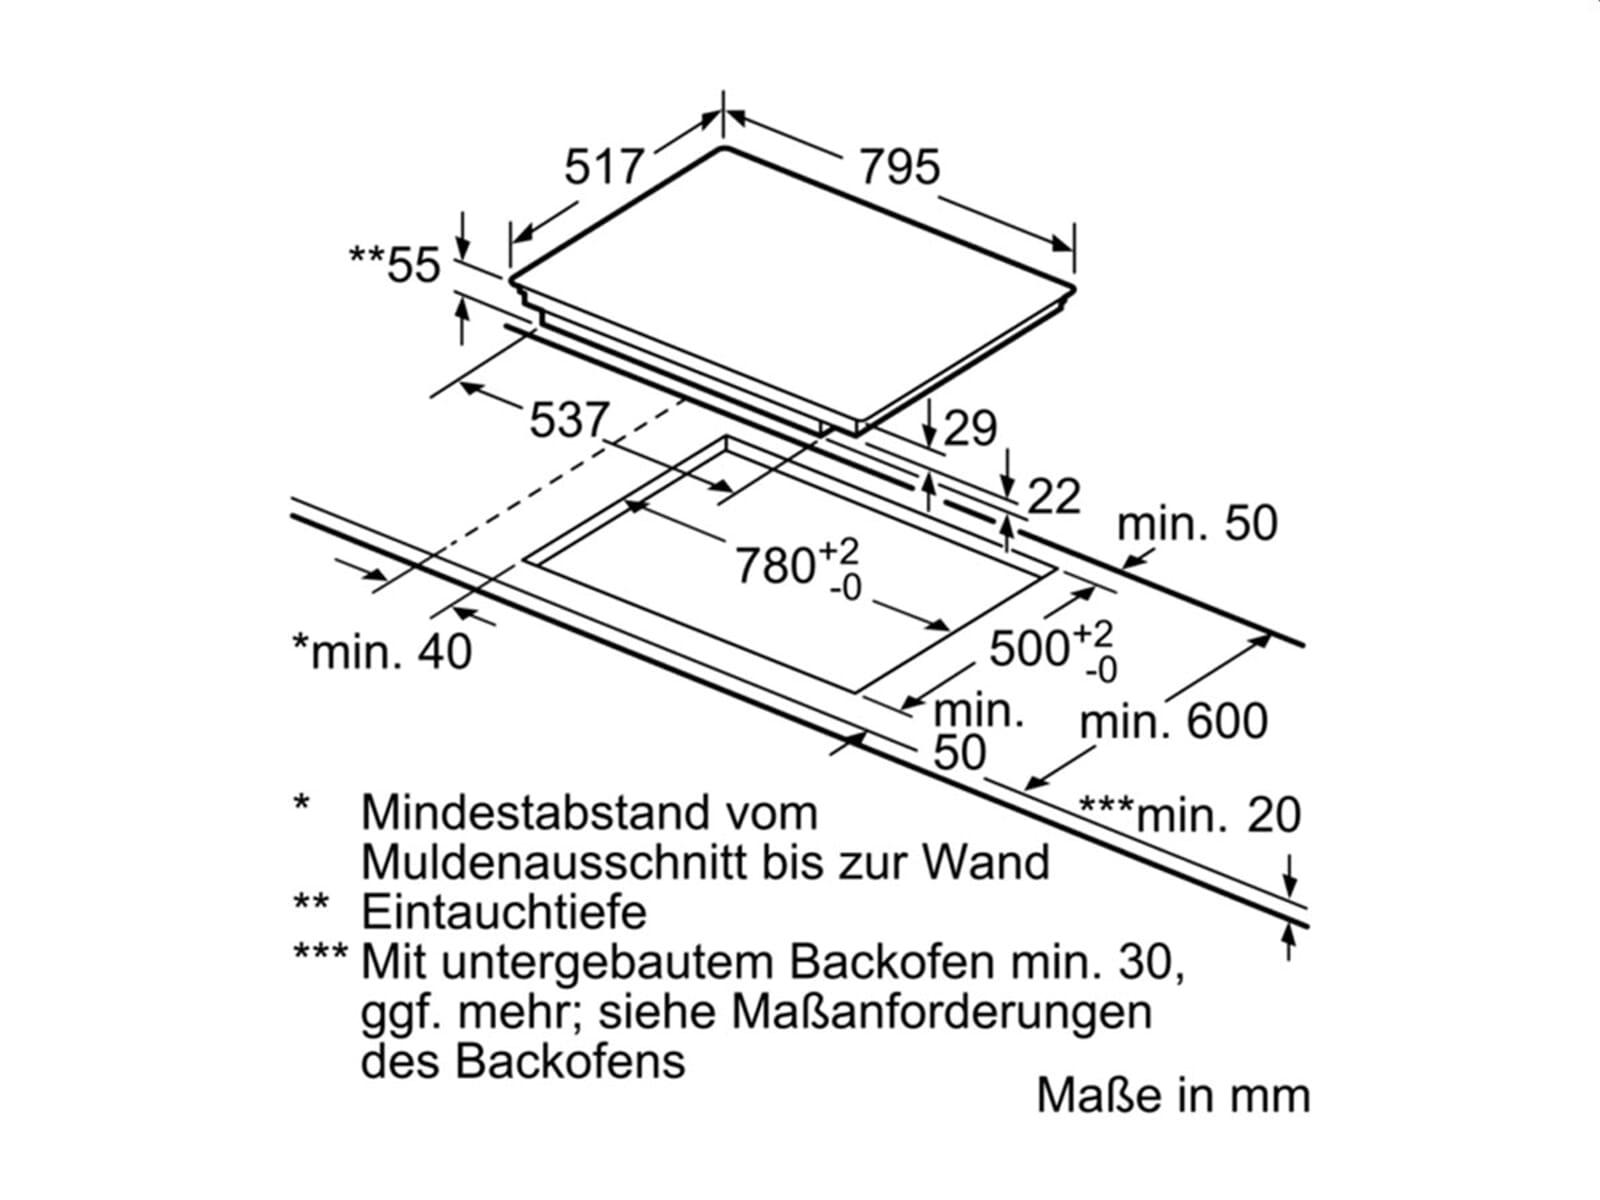 neff tbd 5820 n induktionskochfeld autark ebay. Black Bedroom Furniture Sets. Home Design Ideas